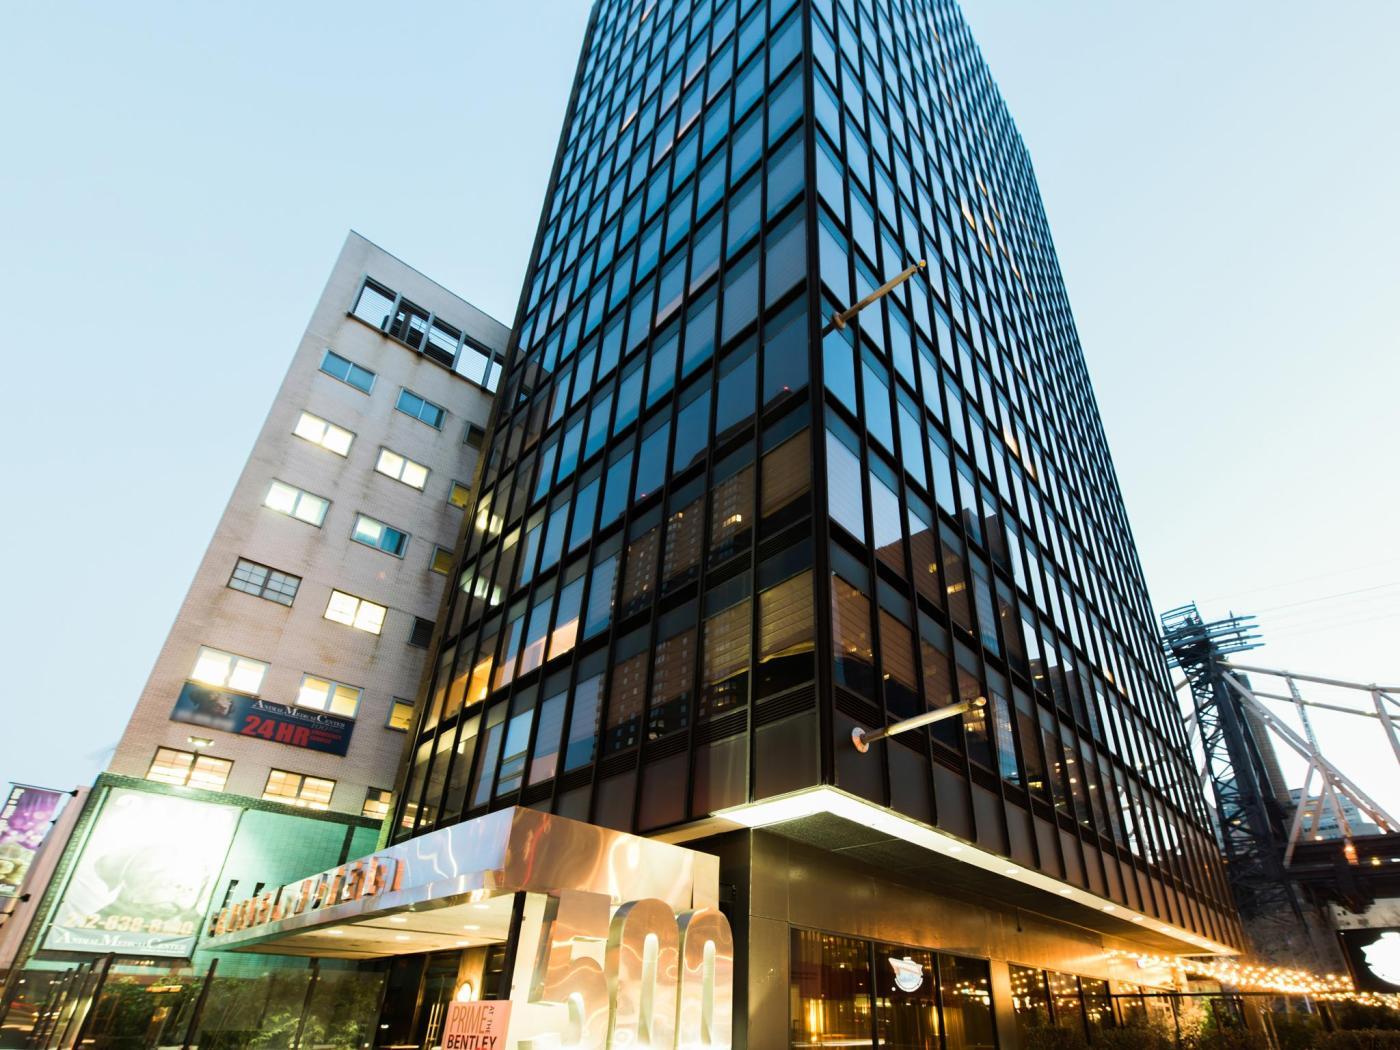 🟊🟊🟊🟊 Bentley Hotel - New York (NY) - United States